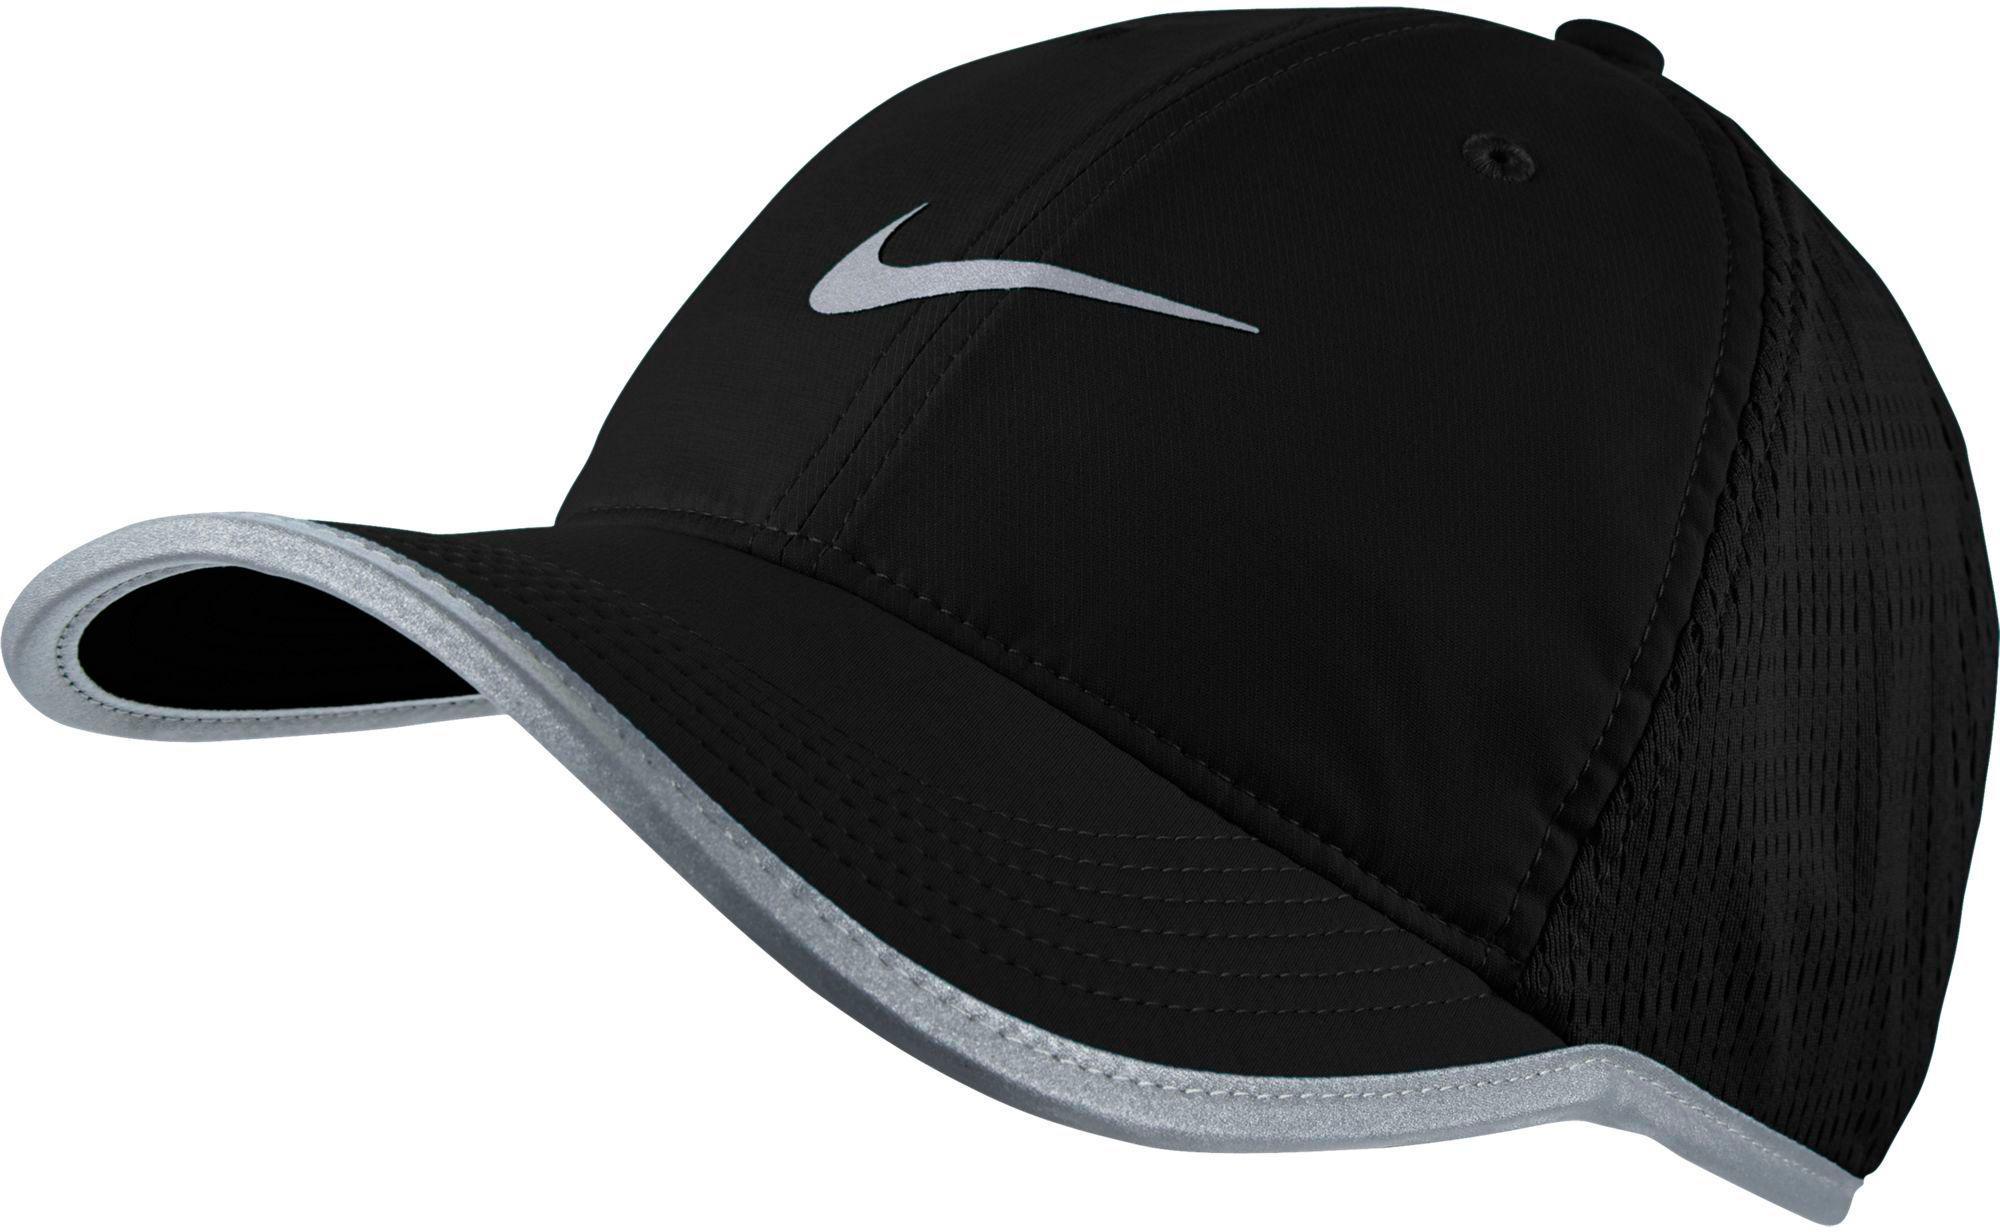 2d7e26e302a ... release date nike. mens black featherlight adjustable running hat c7b53  9b09f